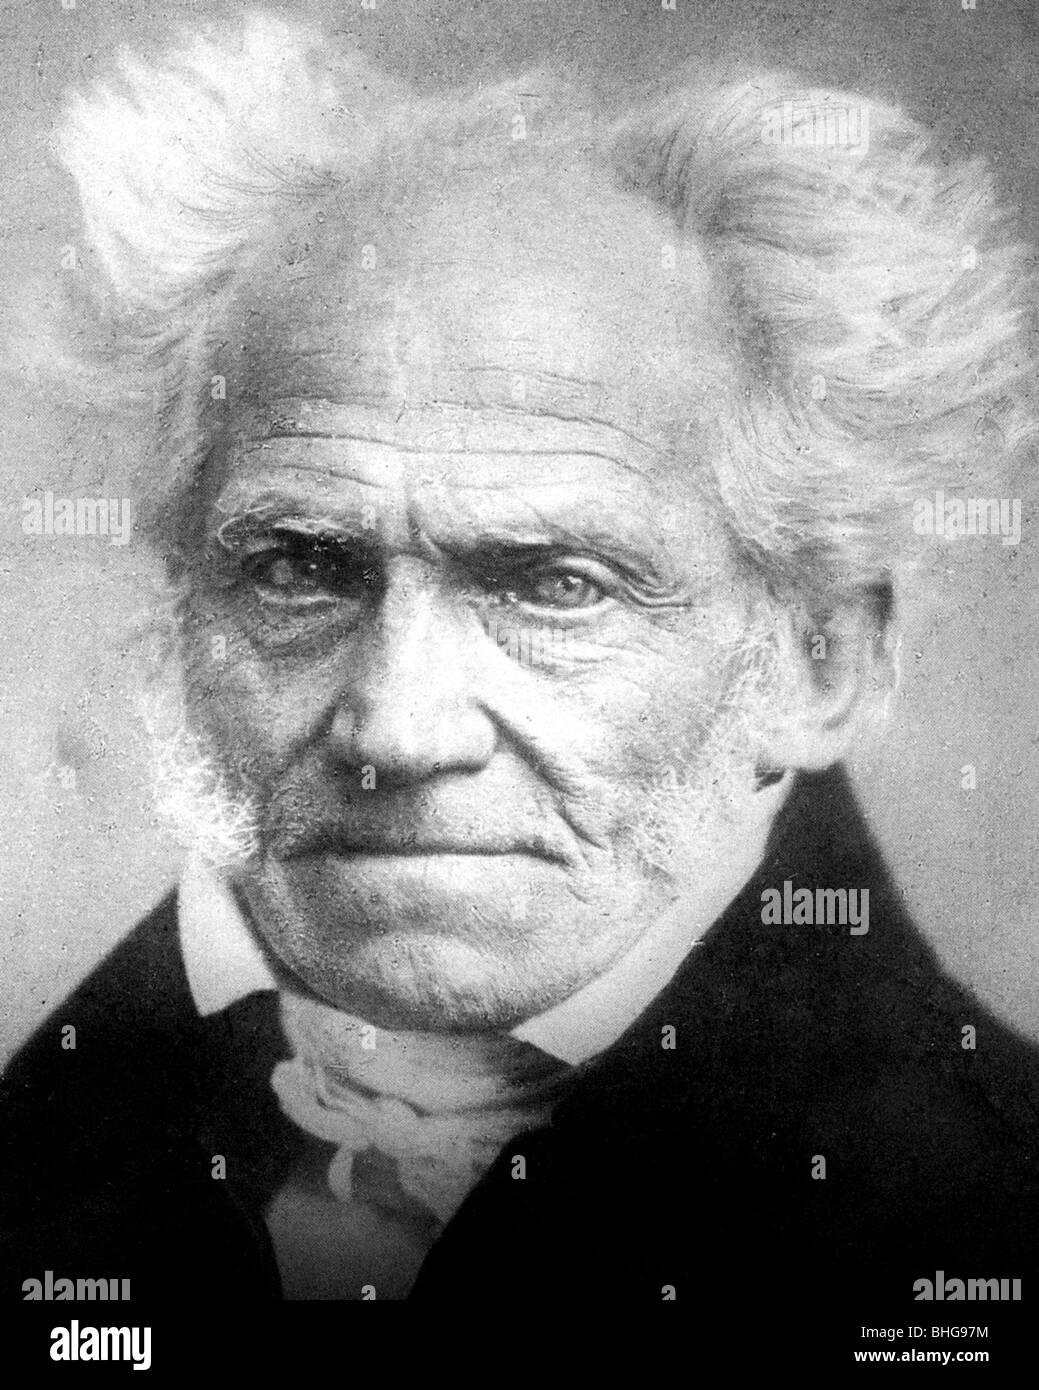 A biography of arthur schopenhauer a german philospher